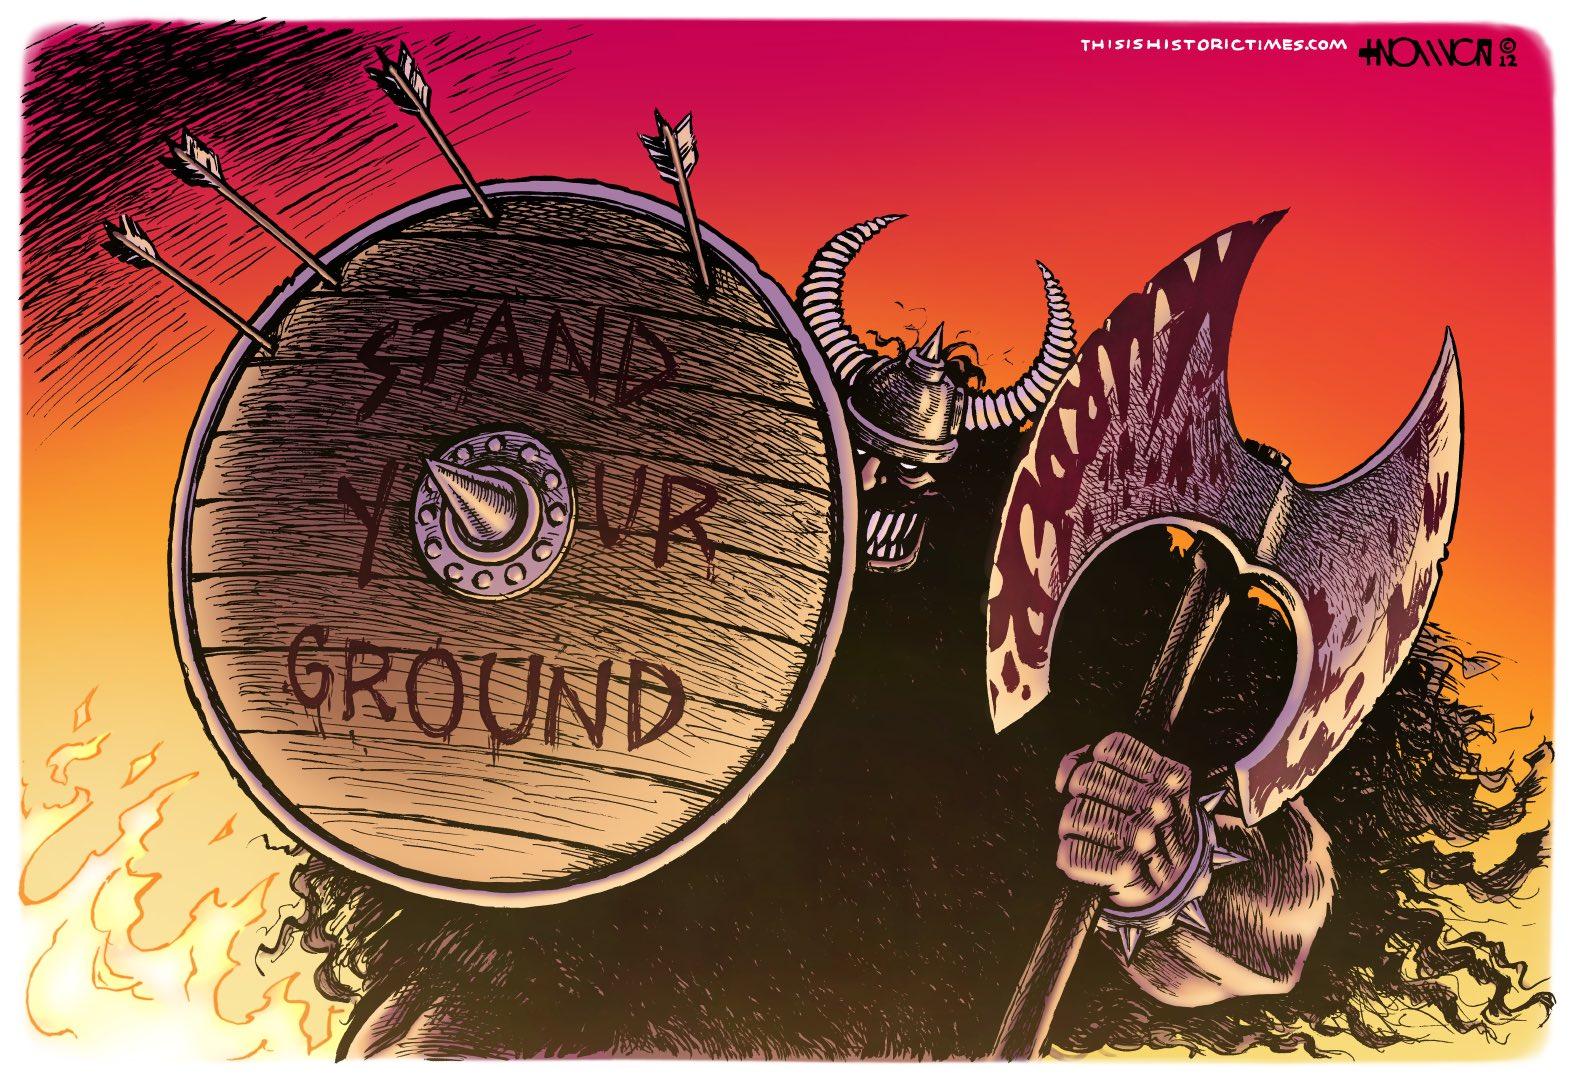 Standing His Ground